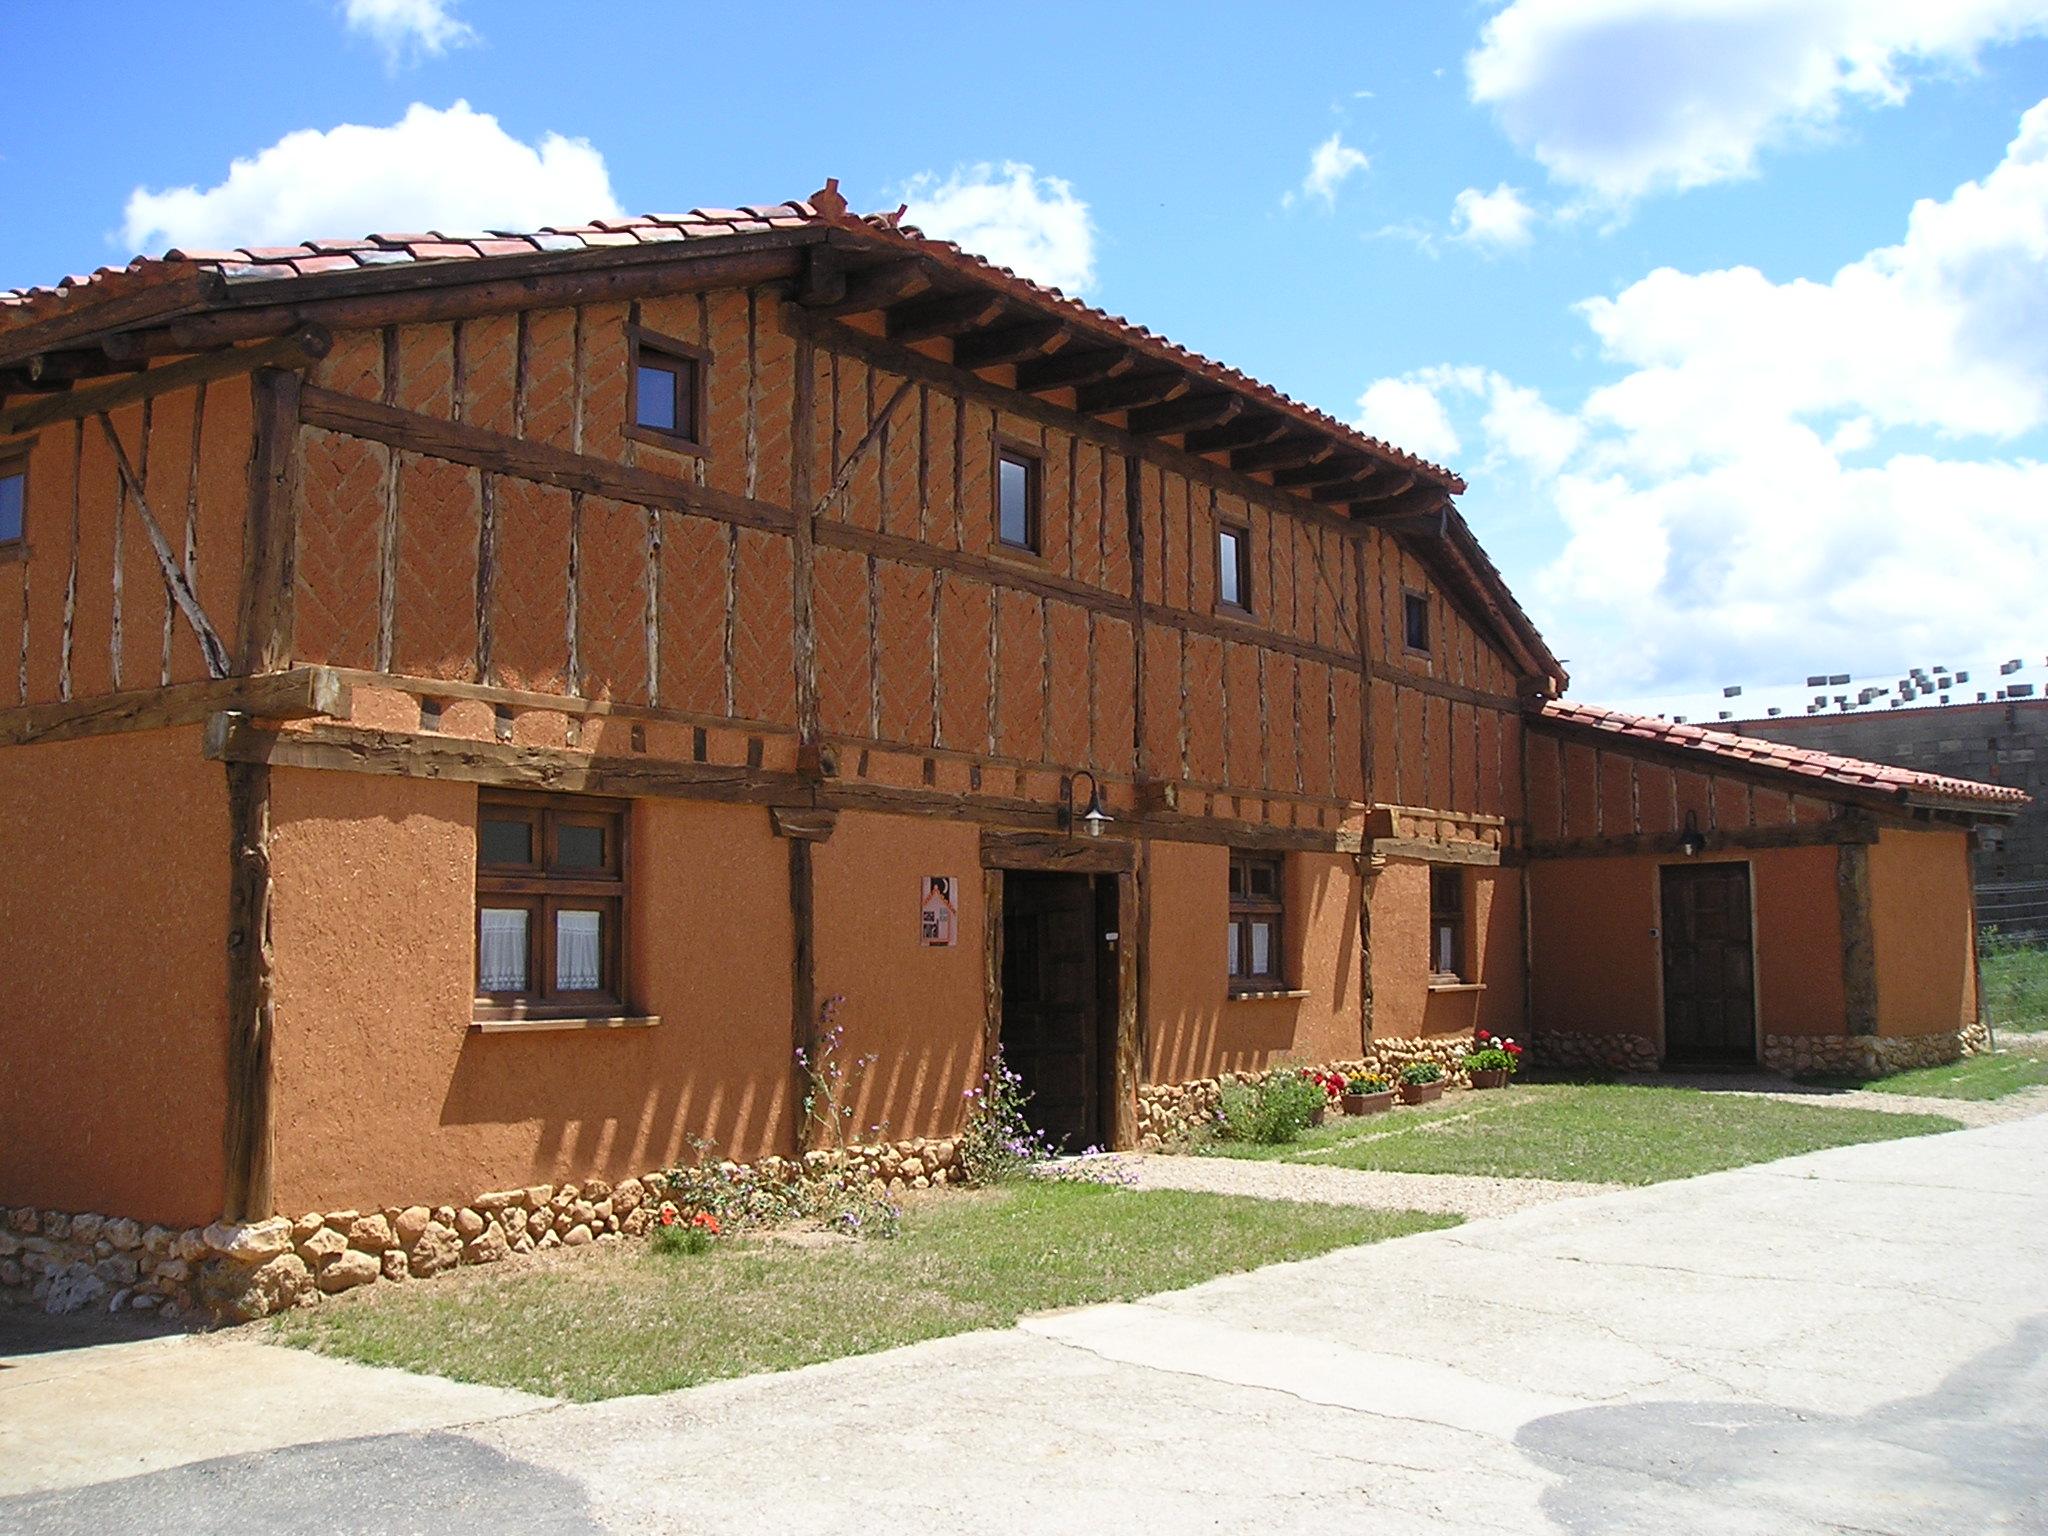 La Casa de Adobe